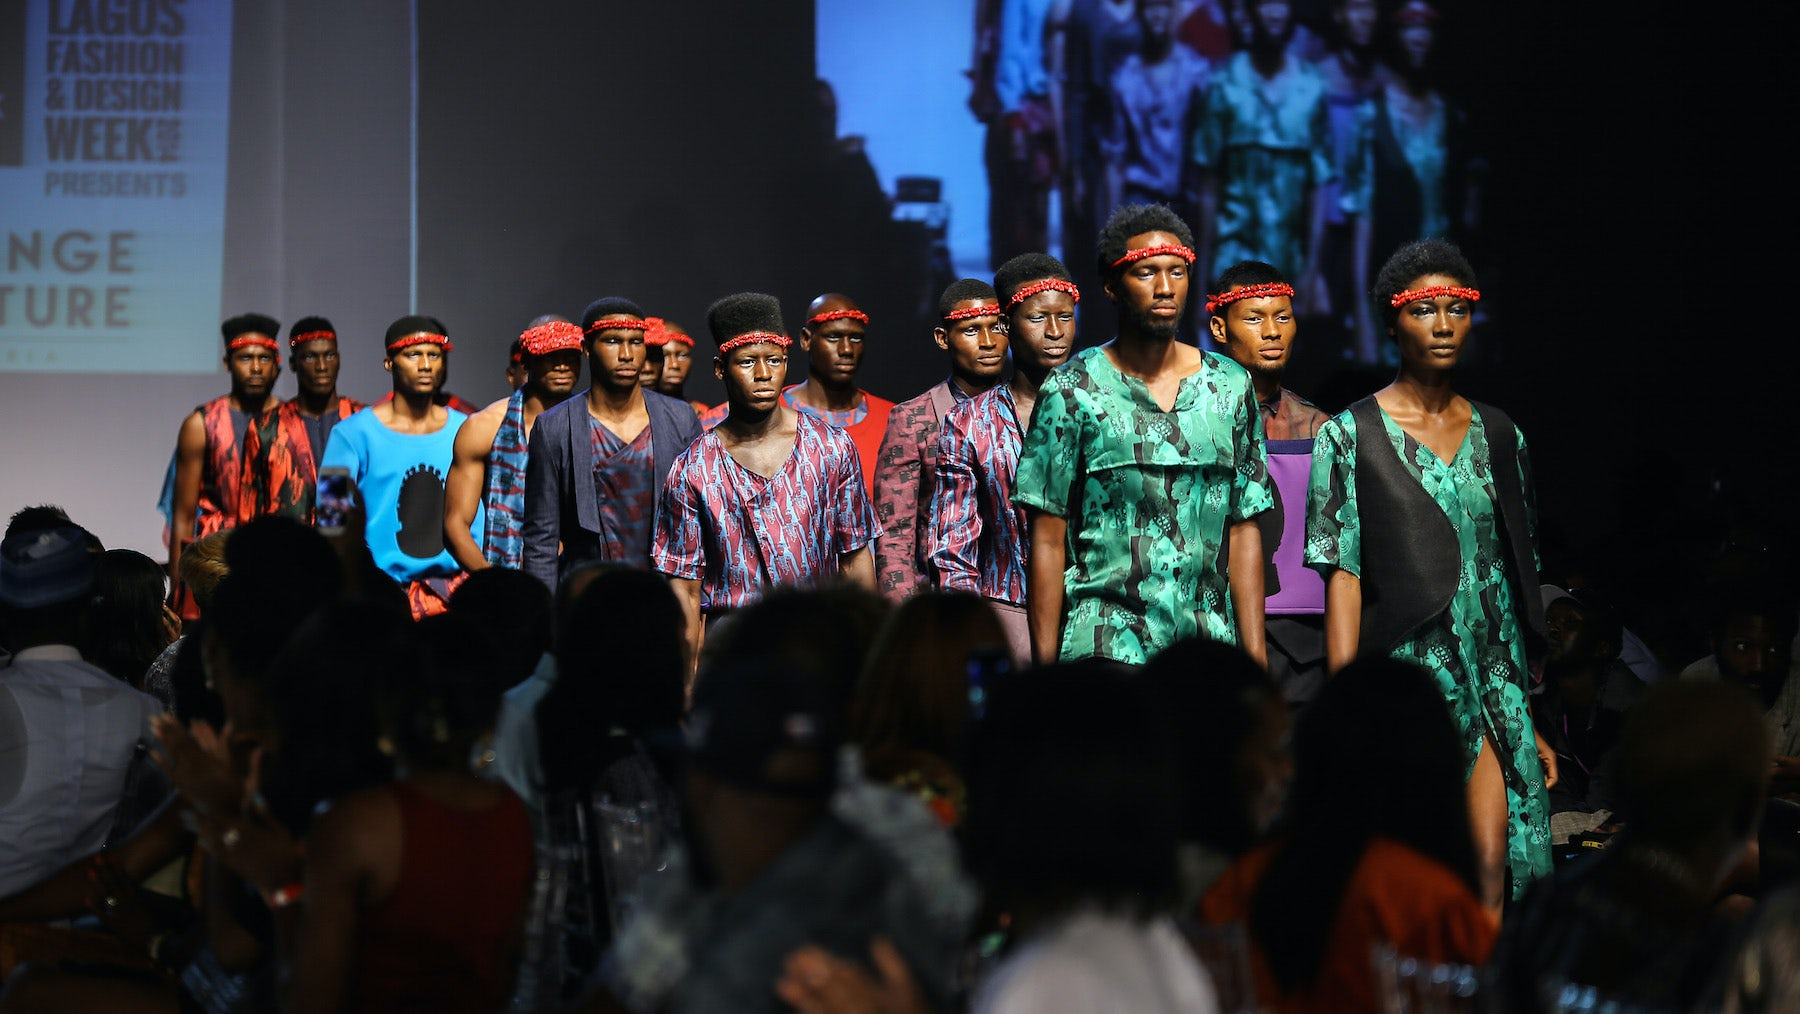 Orange Culture show at Lagos Fashion & Design Week Autumn/Winter 2015 | Source: Courtesy